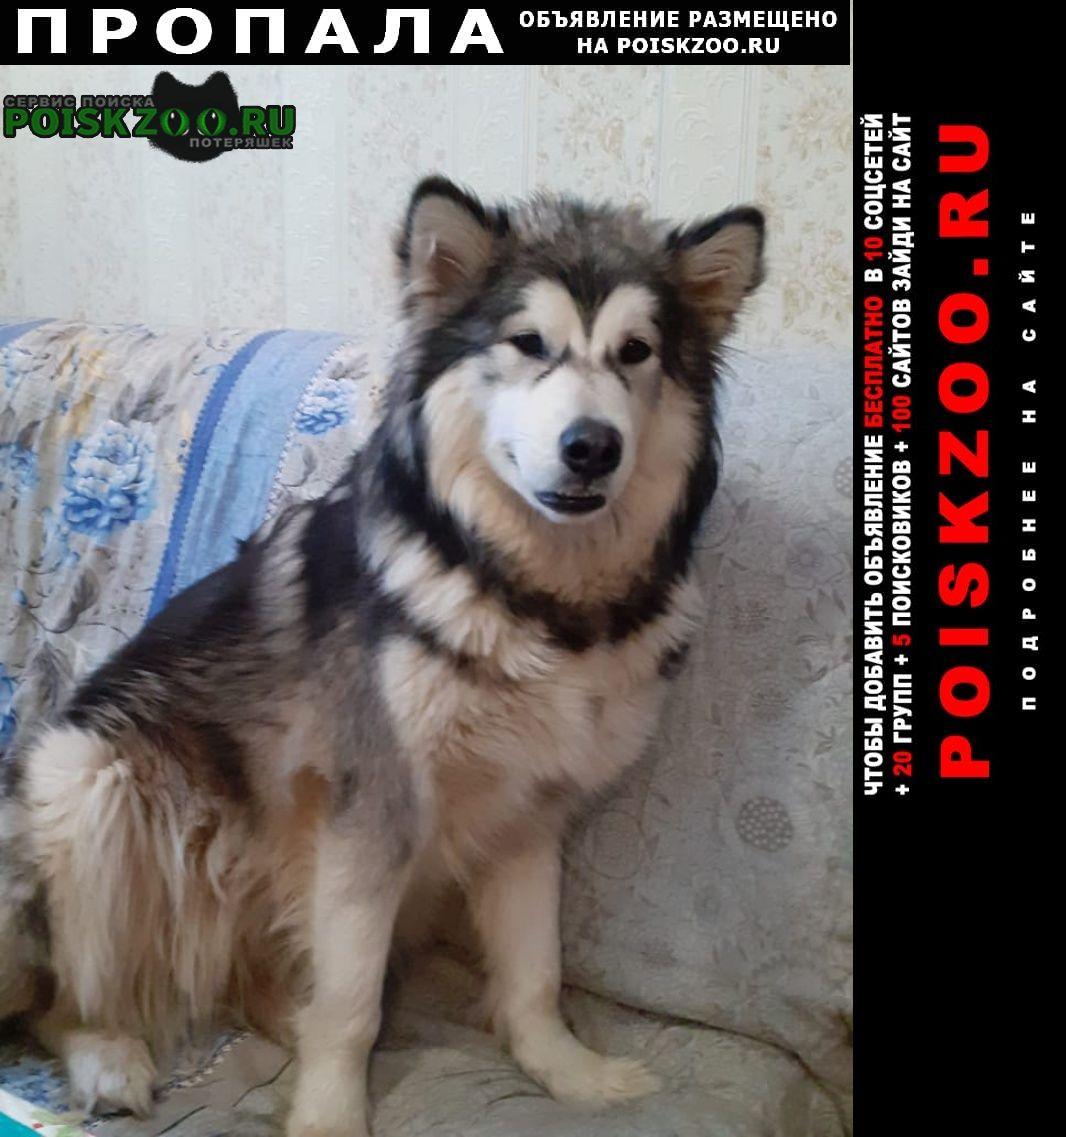 Пропала собака Люберцы